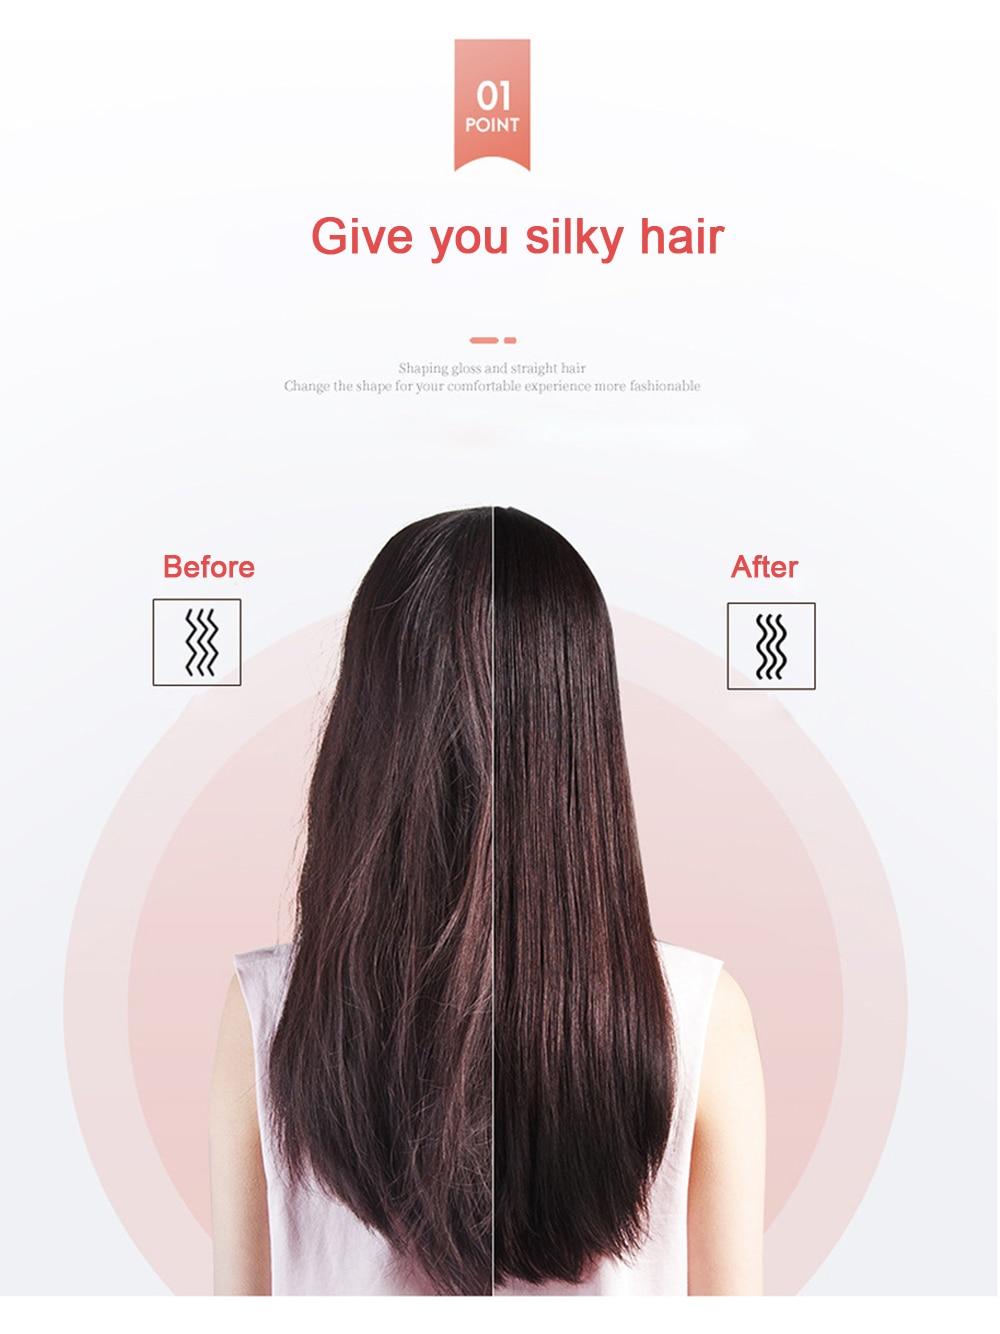 Hair Straightener Hot Comb Hair Straightener Brush Wet Dry Use Brush Comb Hair Straight Styler Curling Iron Curler Comb enlarge